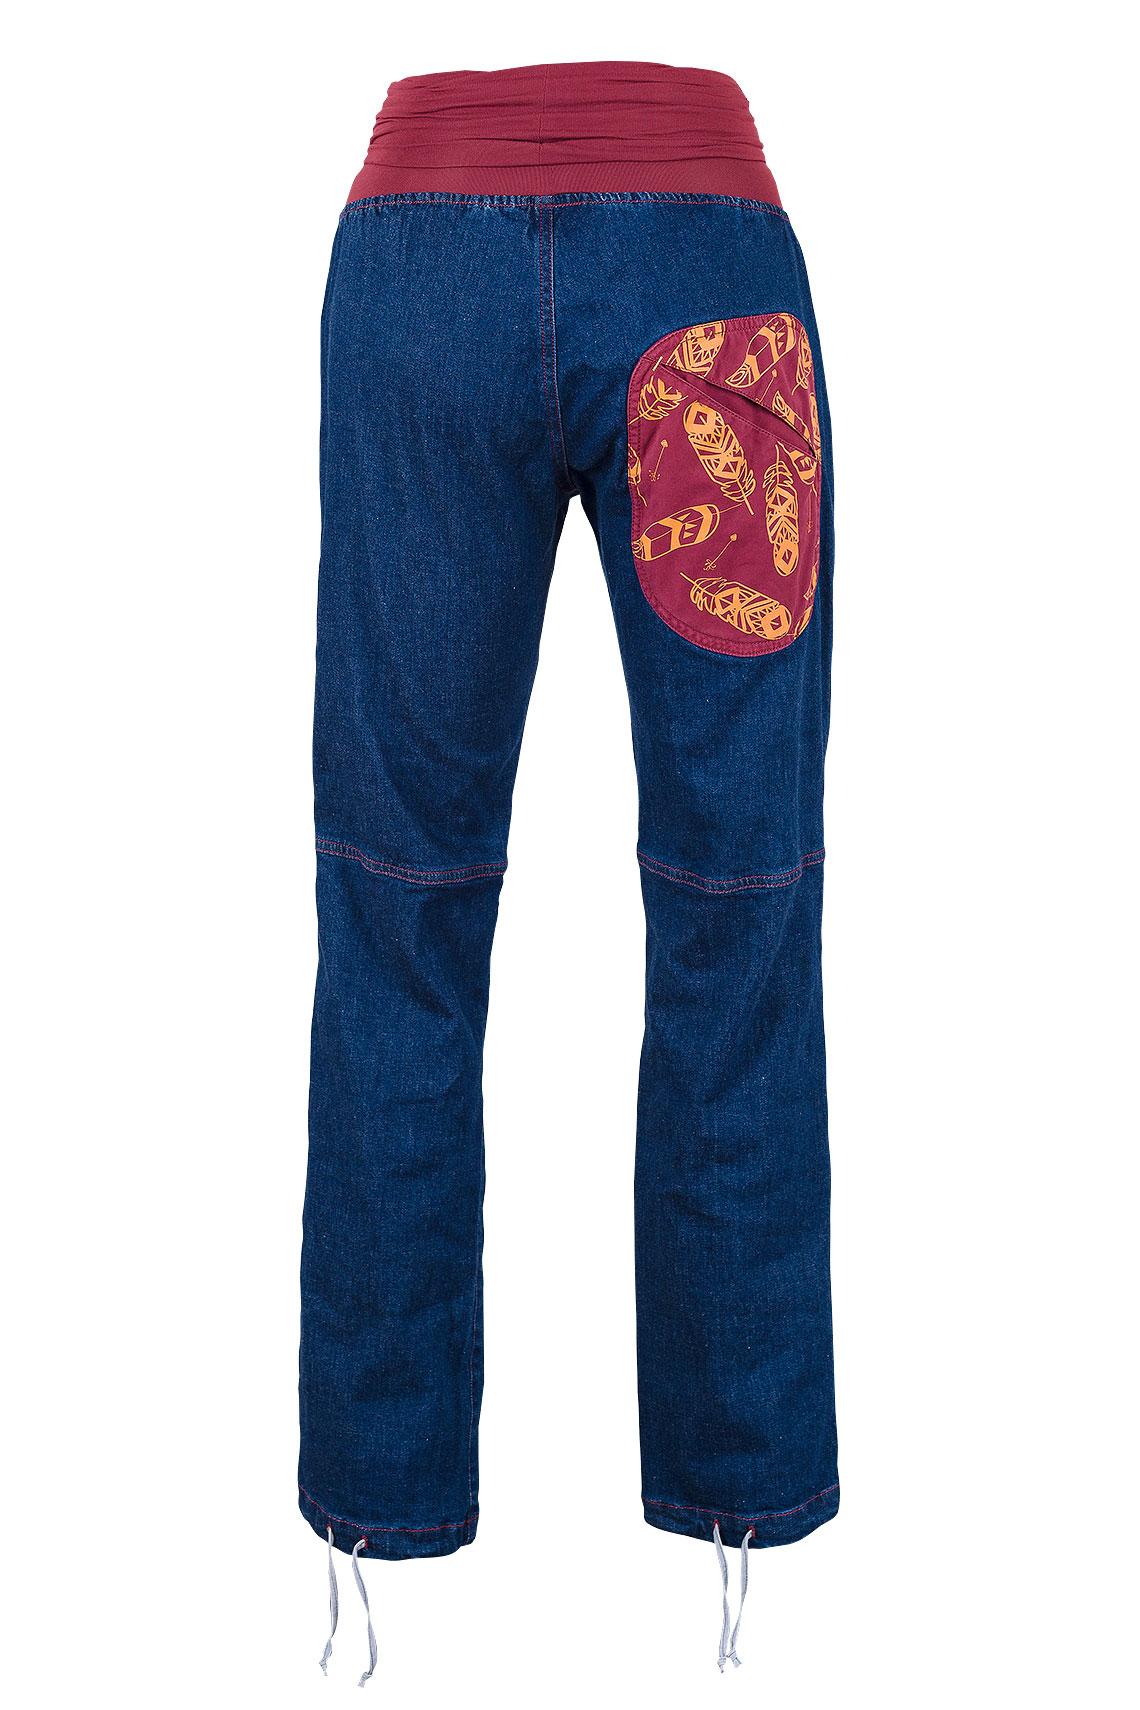 NYE_LADY_BACK_jeans